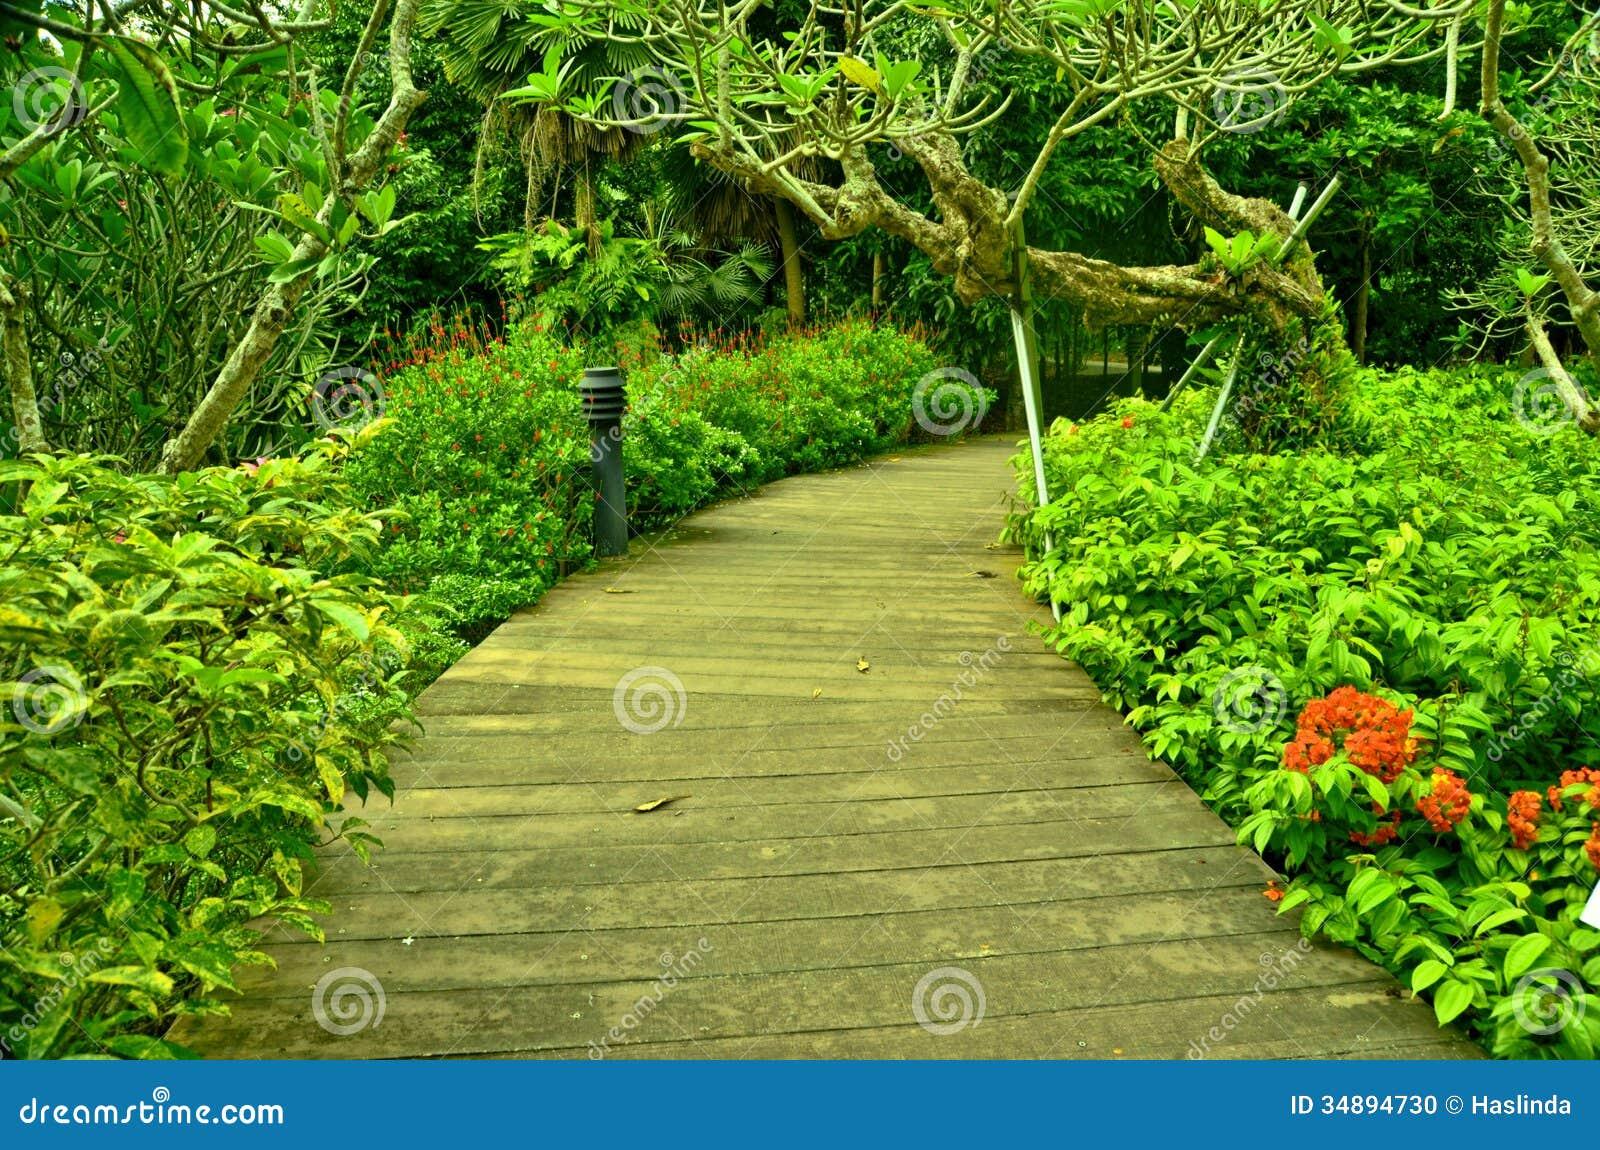 garden path singapore botanic gardens stock photo image 34894730. Black Bedroom Furniture Sets. Home Design Ideas